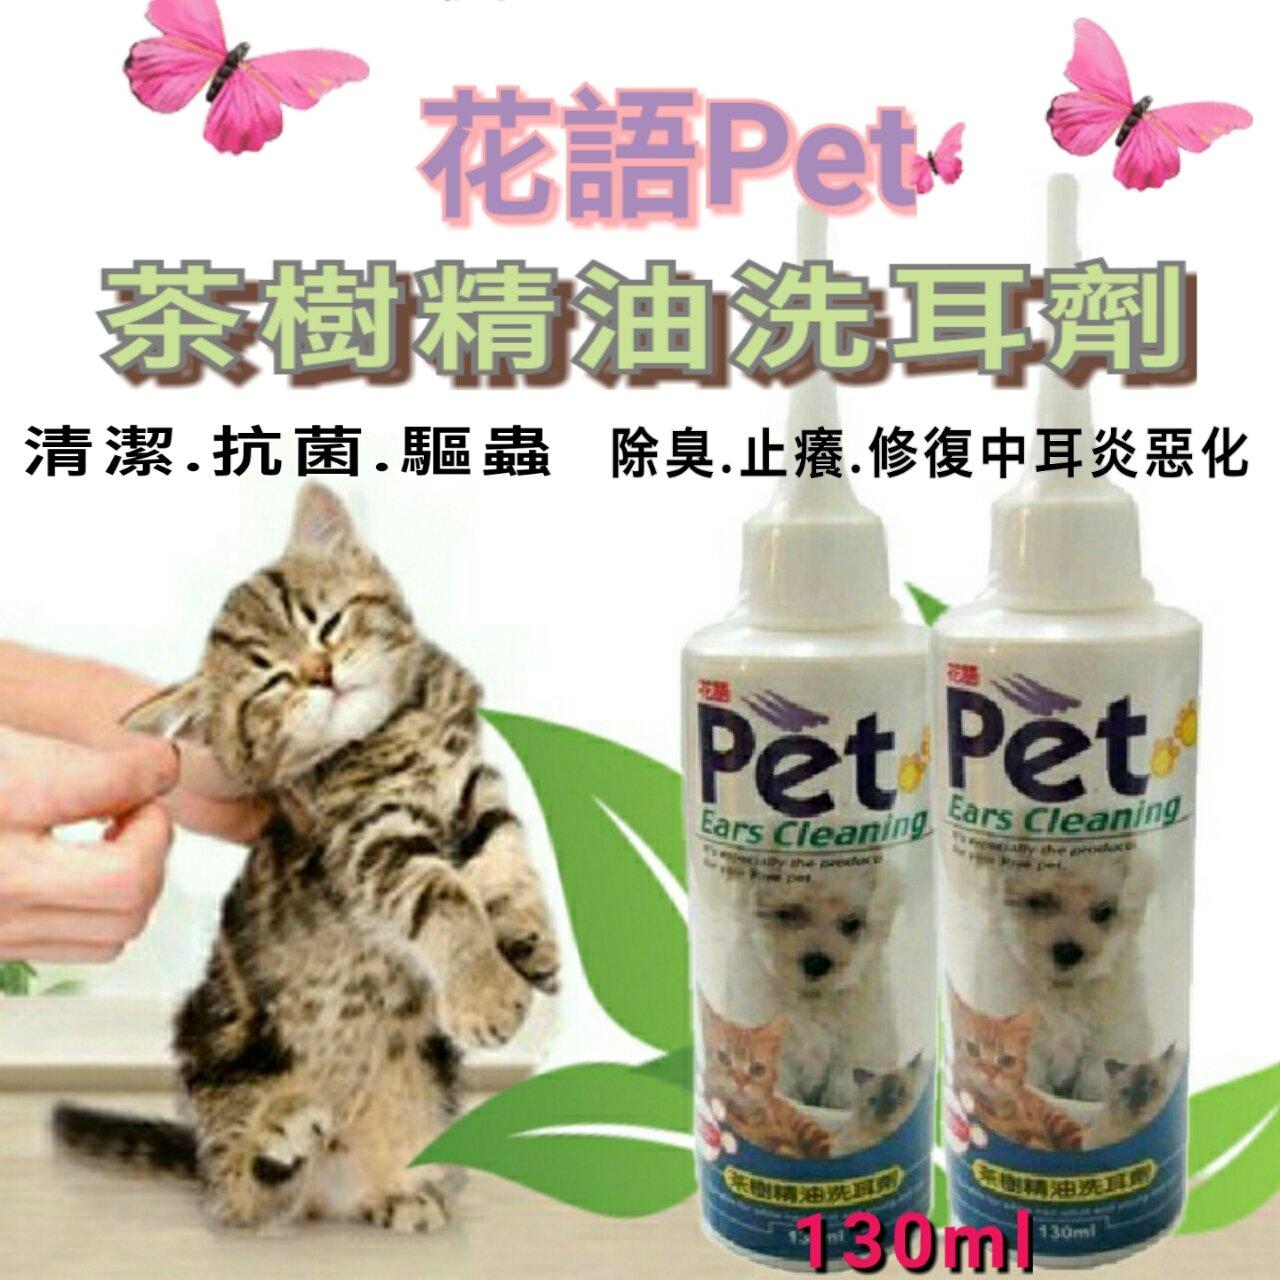 PET 三效合一 茶樹精油洗耳劑 130ml 瓶 寵物